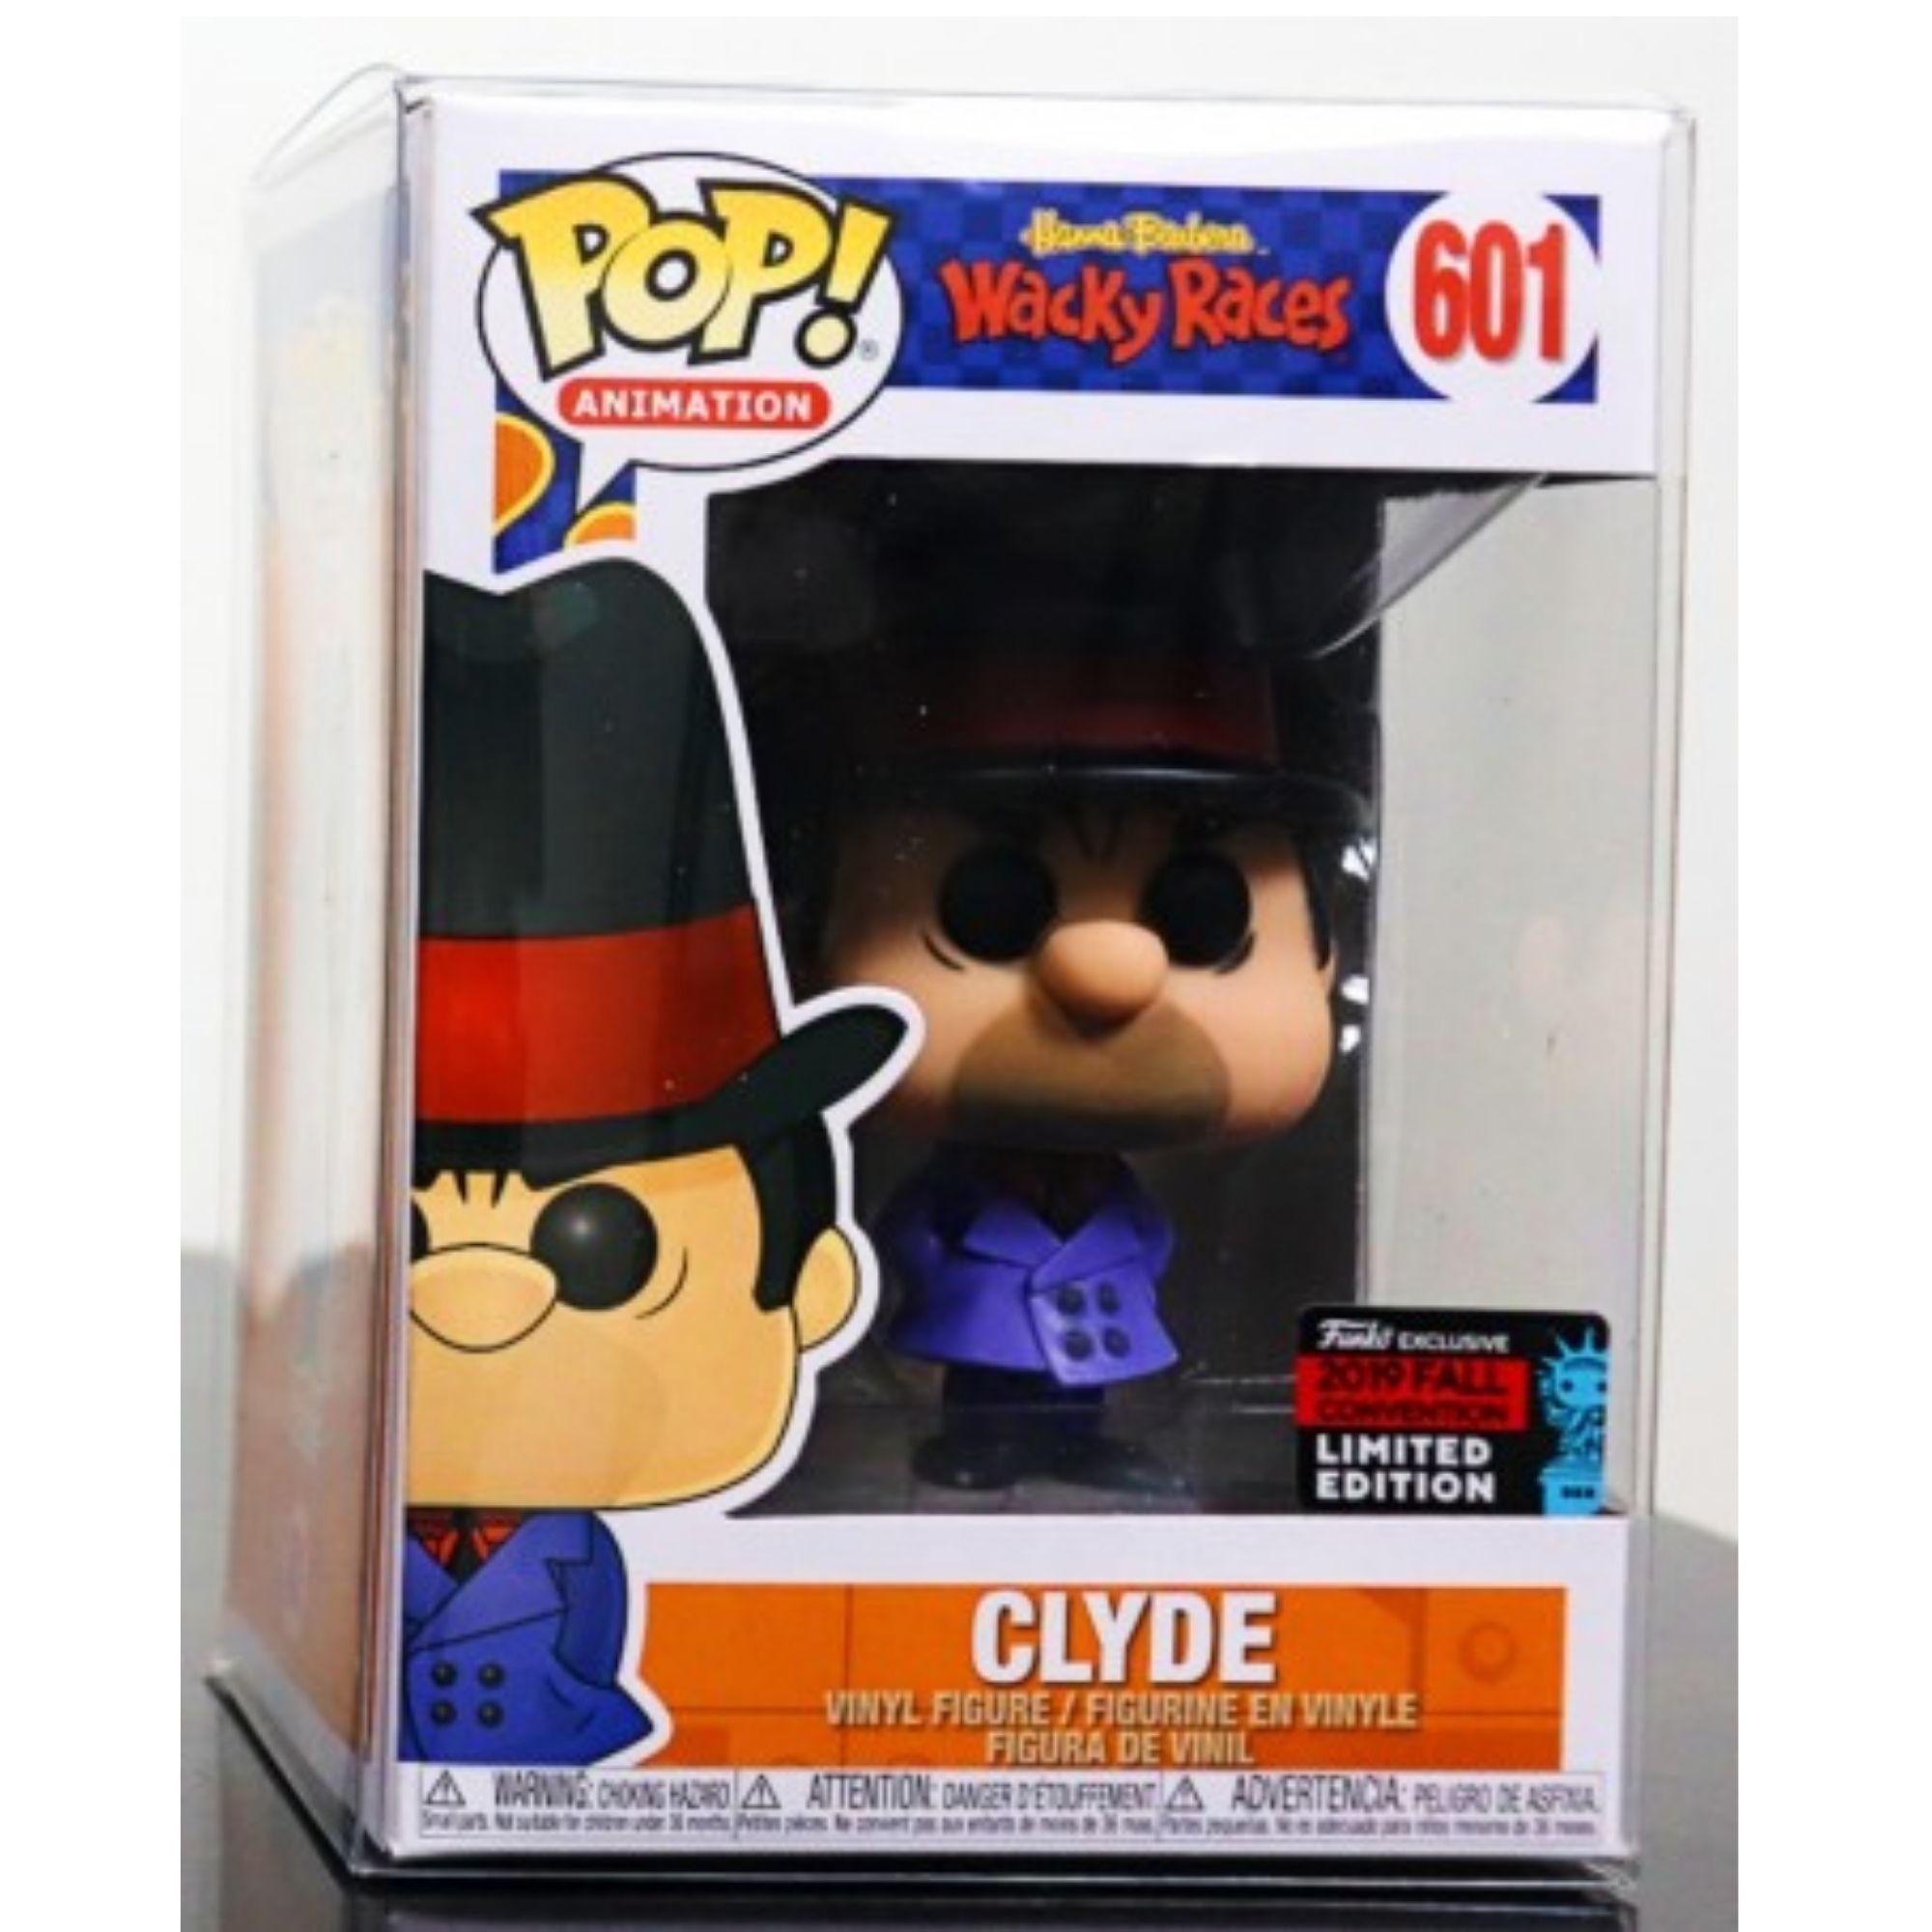 Funko Pop Clyde Wackys Races Hanna Barbera Nycc 2019 #601  - Game Land Brinquedos